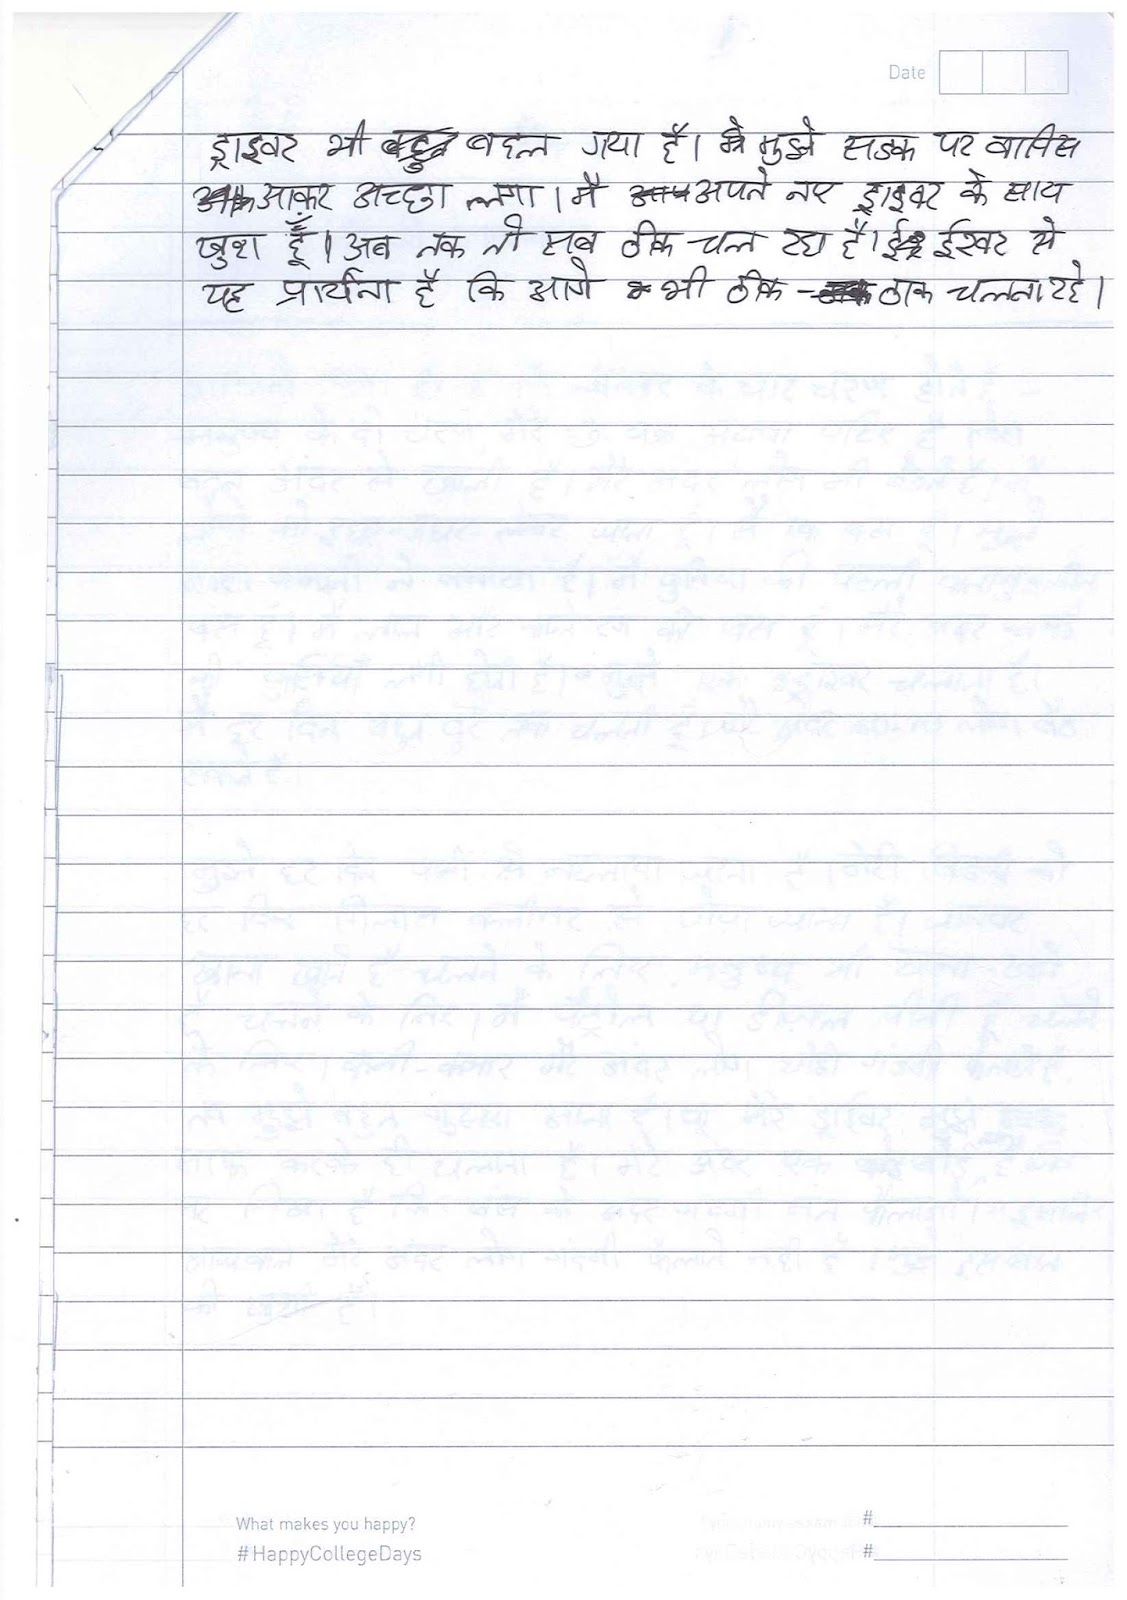 Kalam Mein Talwar Se Zyada Taqat Hai Urdu Essay Talwar Aur Kalam Speech Qalam